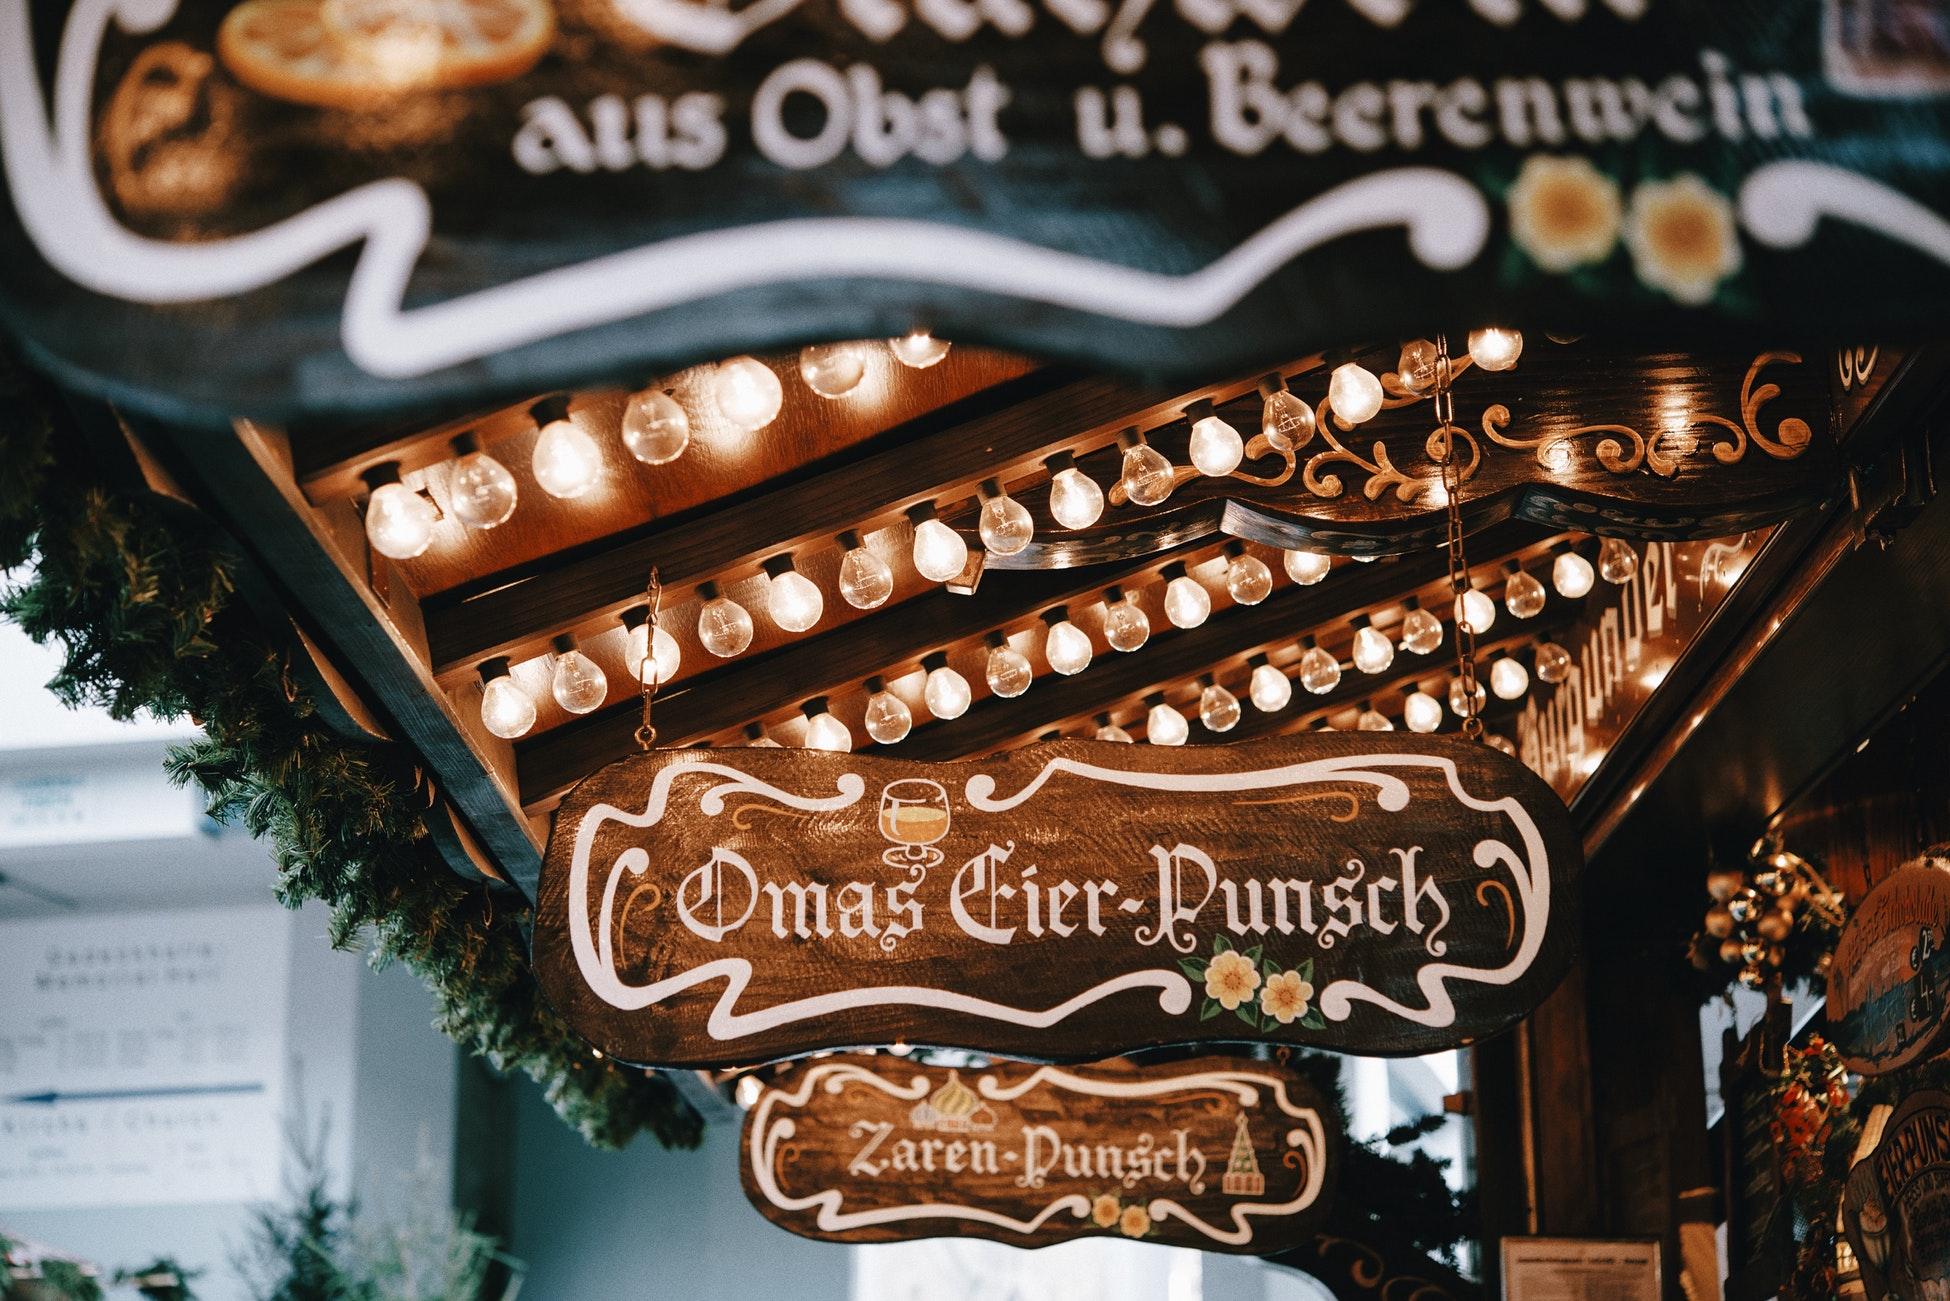 Christmas Beers.jpeg